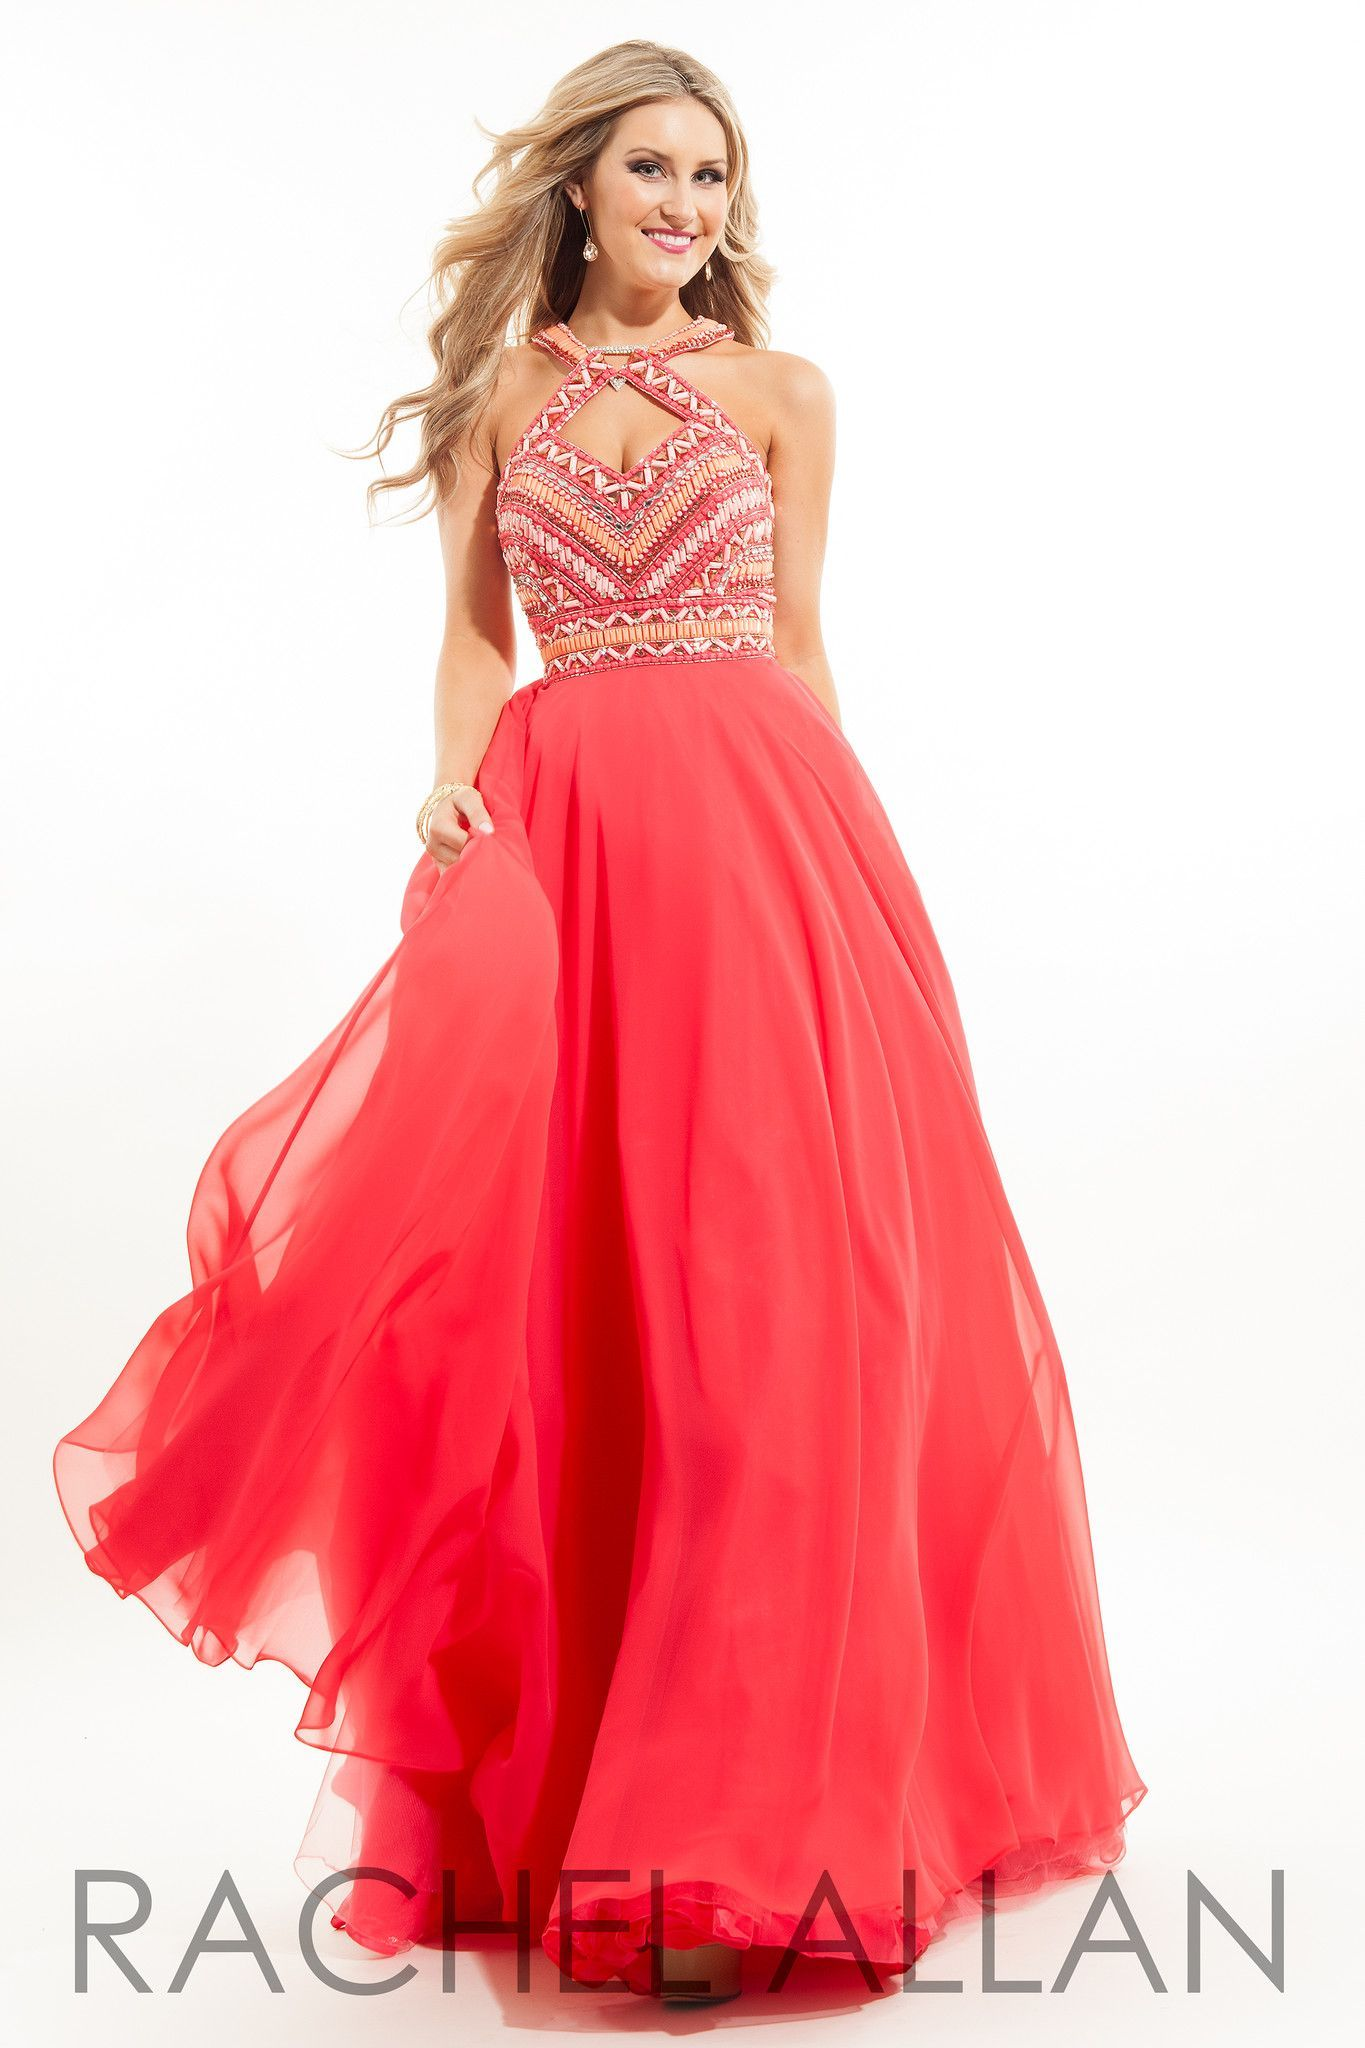 Rachel allan prom looks pinterest prom js prom and